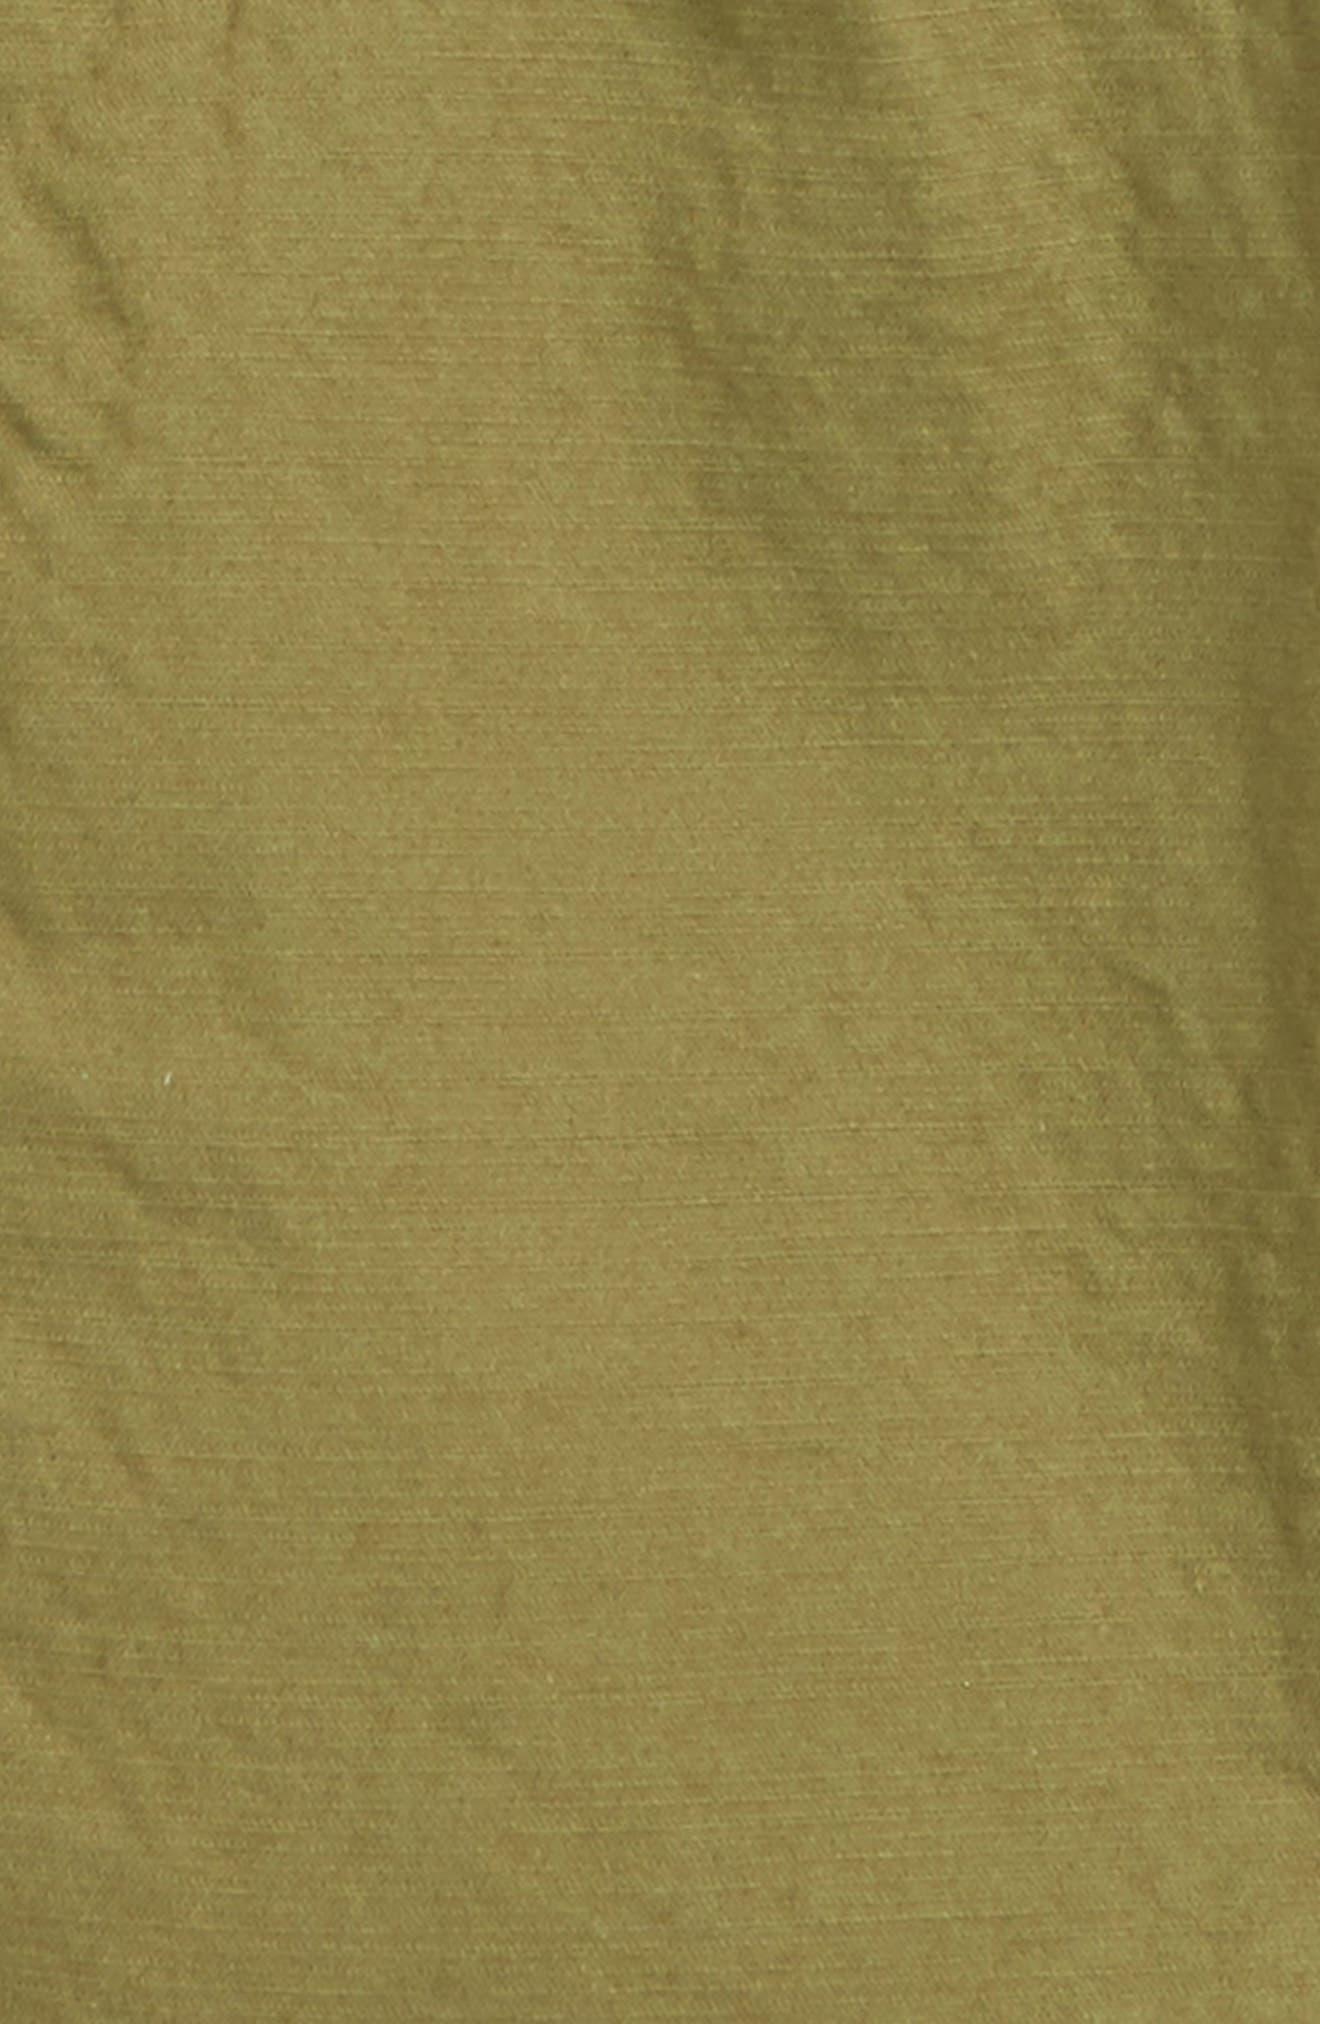 Surplus Chambray Shorts,                             Alternate thumbnail 2, color,                             300